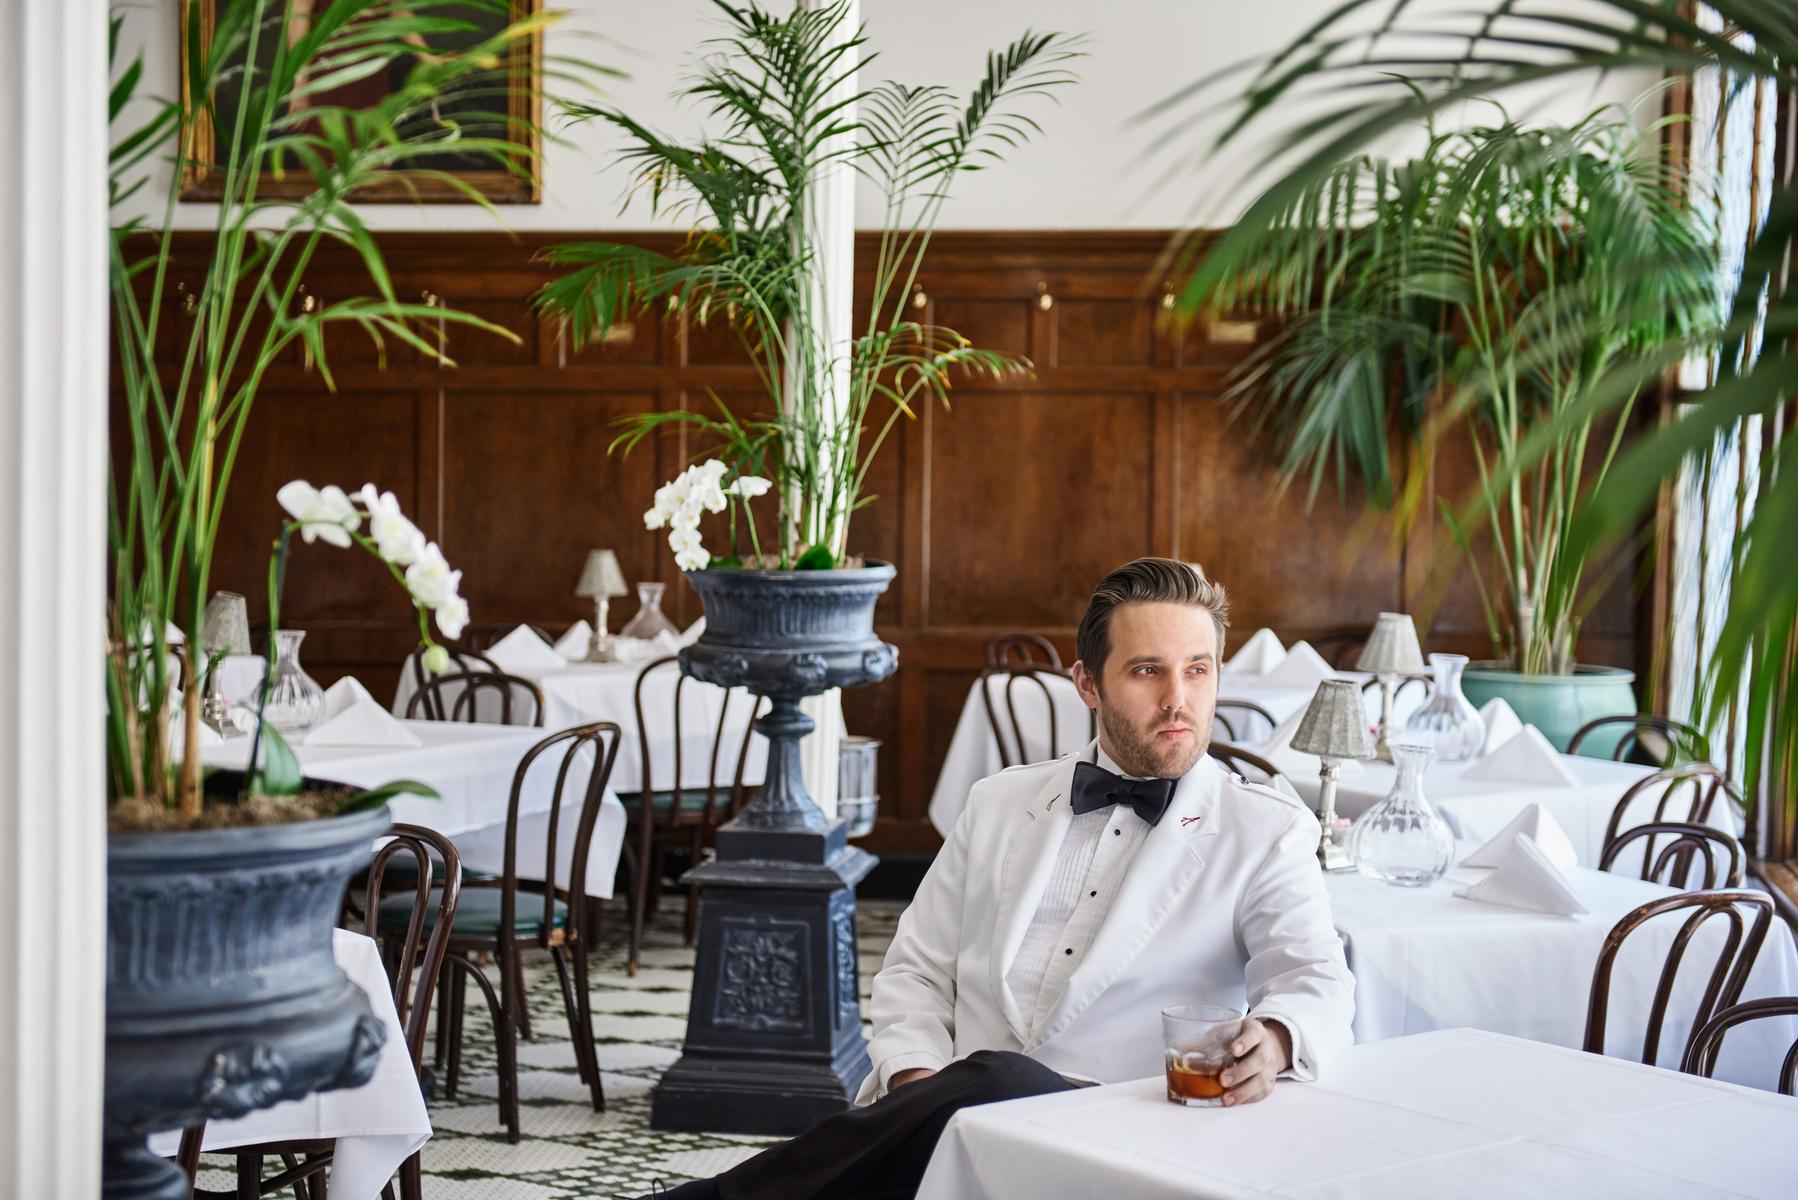 Hadi Ktiri, 29, bartender at French 75 Bar shot by new orleans based photographer Craig Mulcahy. Shoot for Zagat/Google's 30 under 30 in NOLA.